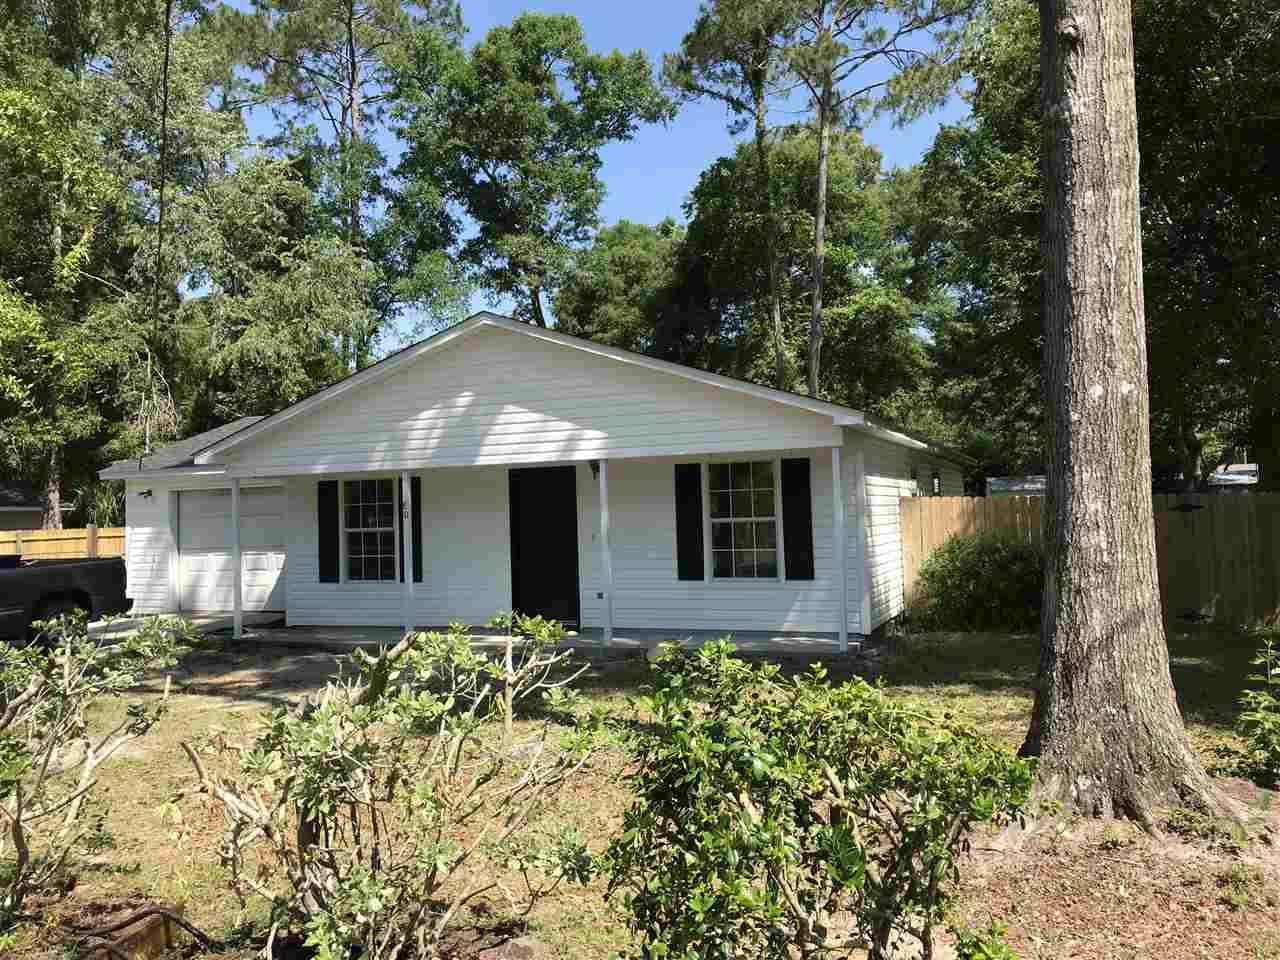 Property ID 293839